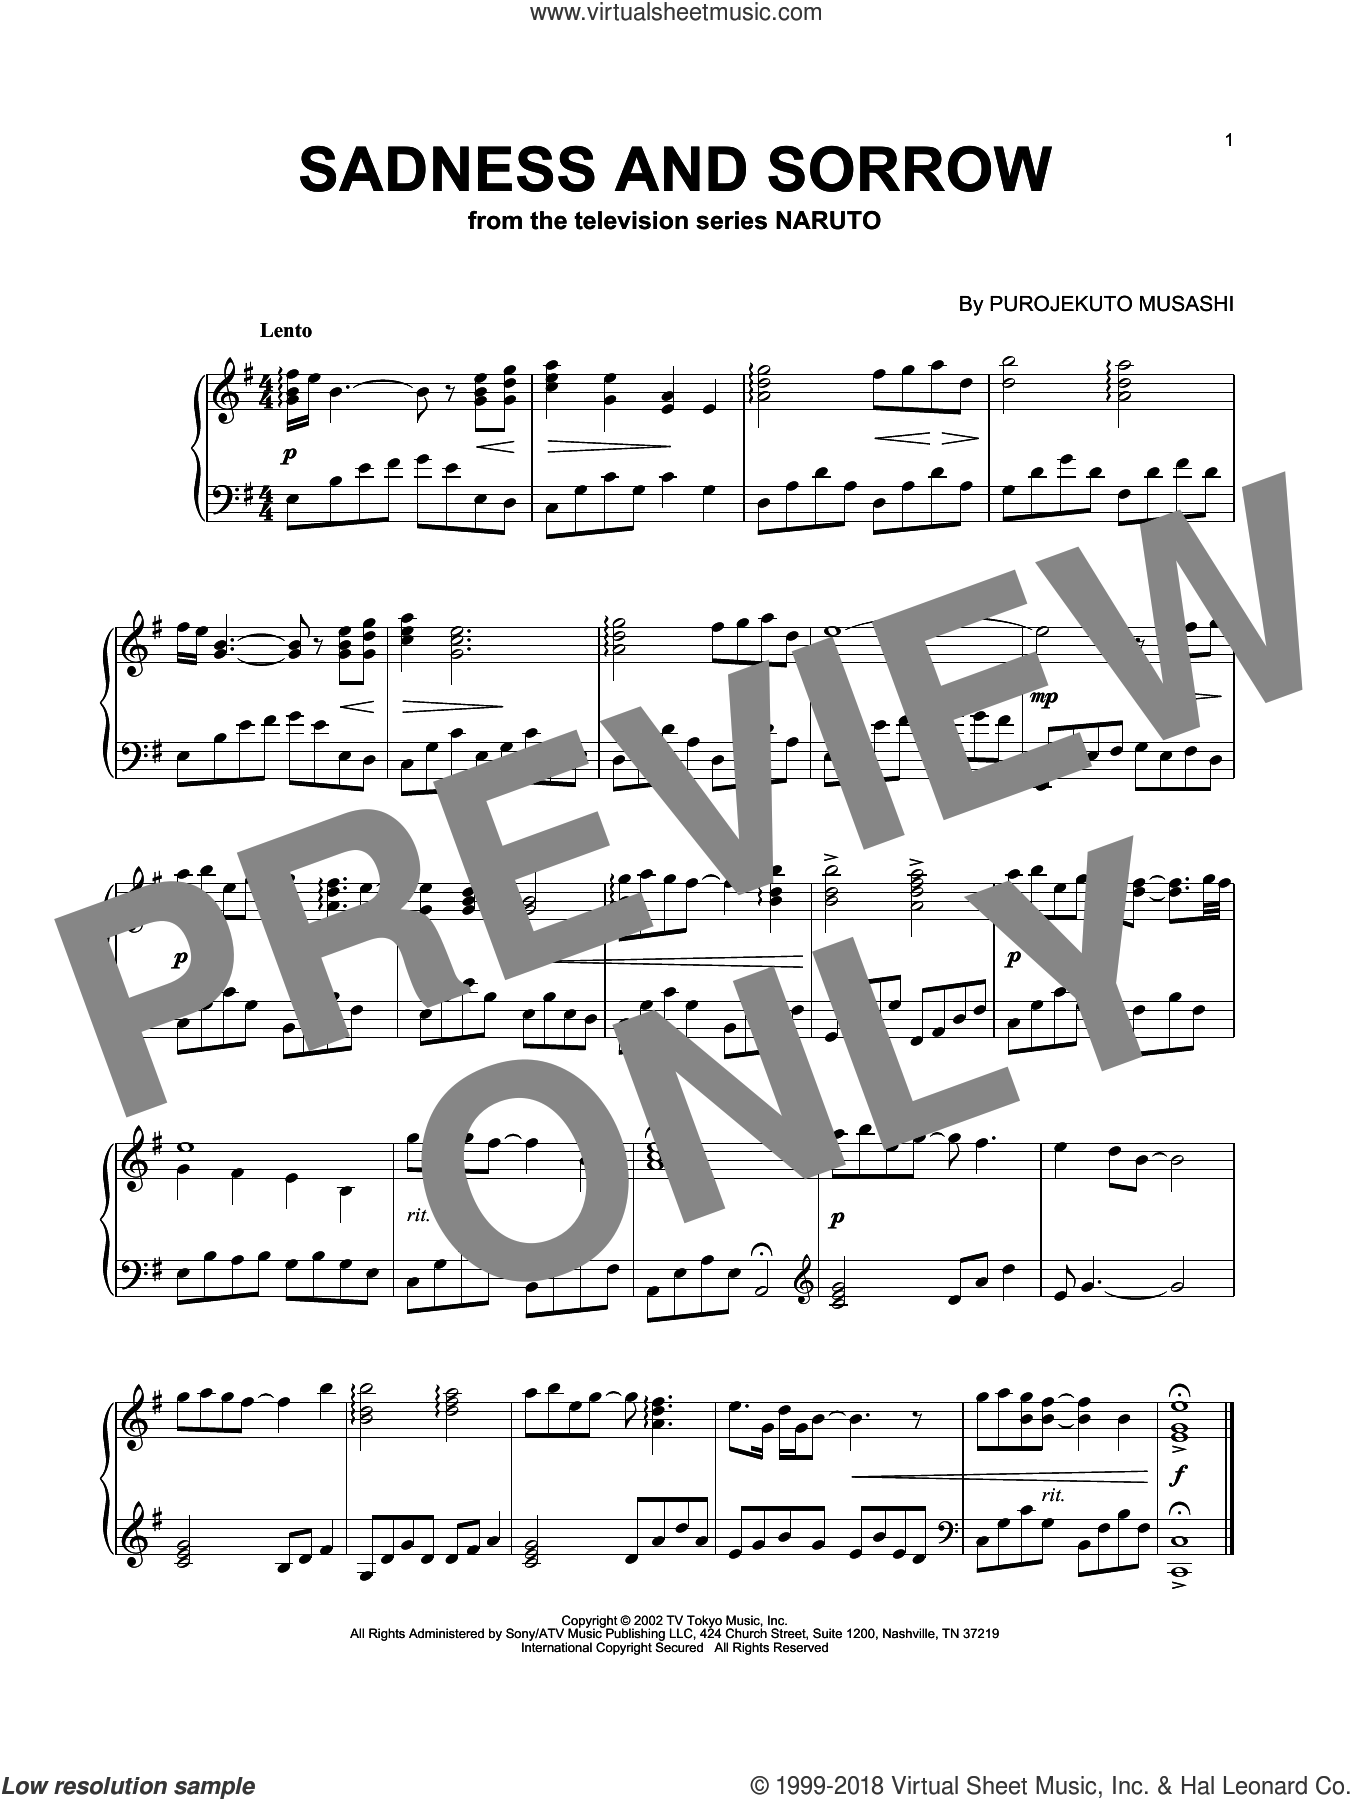 Sadness And Sorrow (from Naruto), (intermediate) sheet music for piano solo by Taylor Davis and Purojekuto Musashi, intermediate skill level